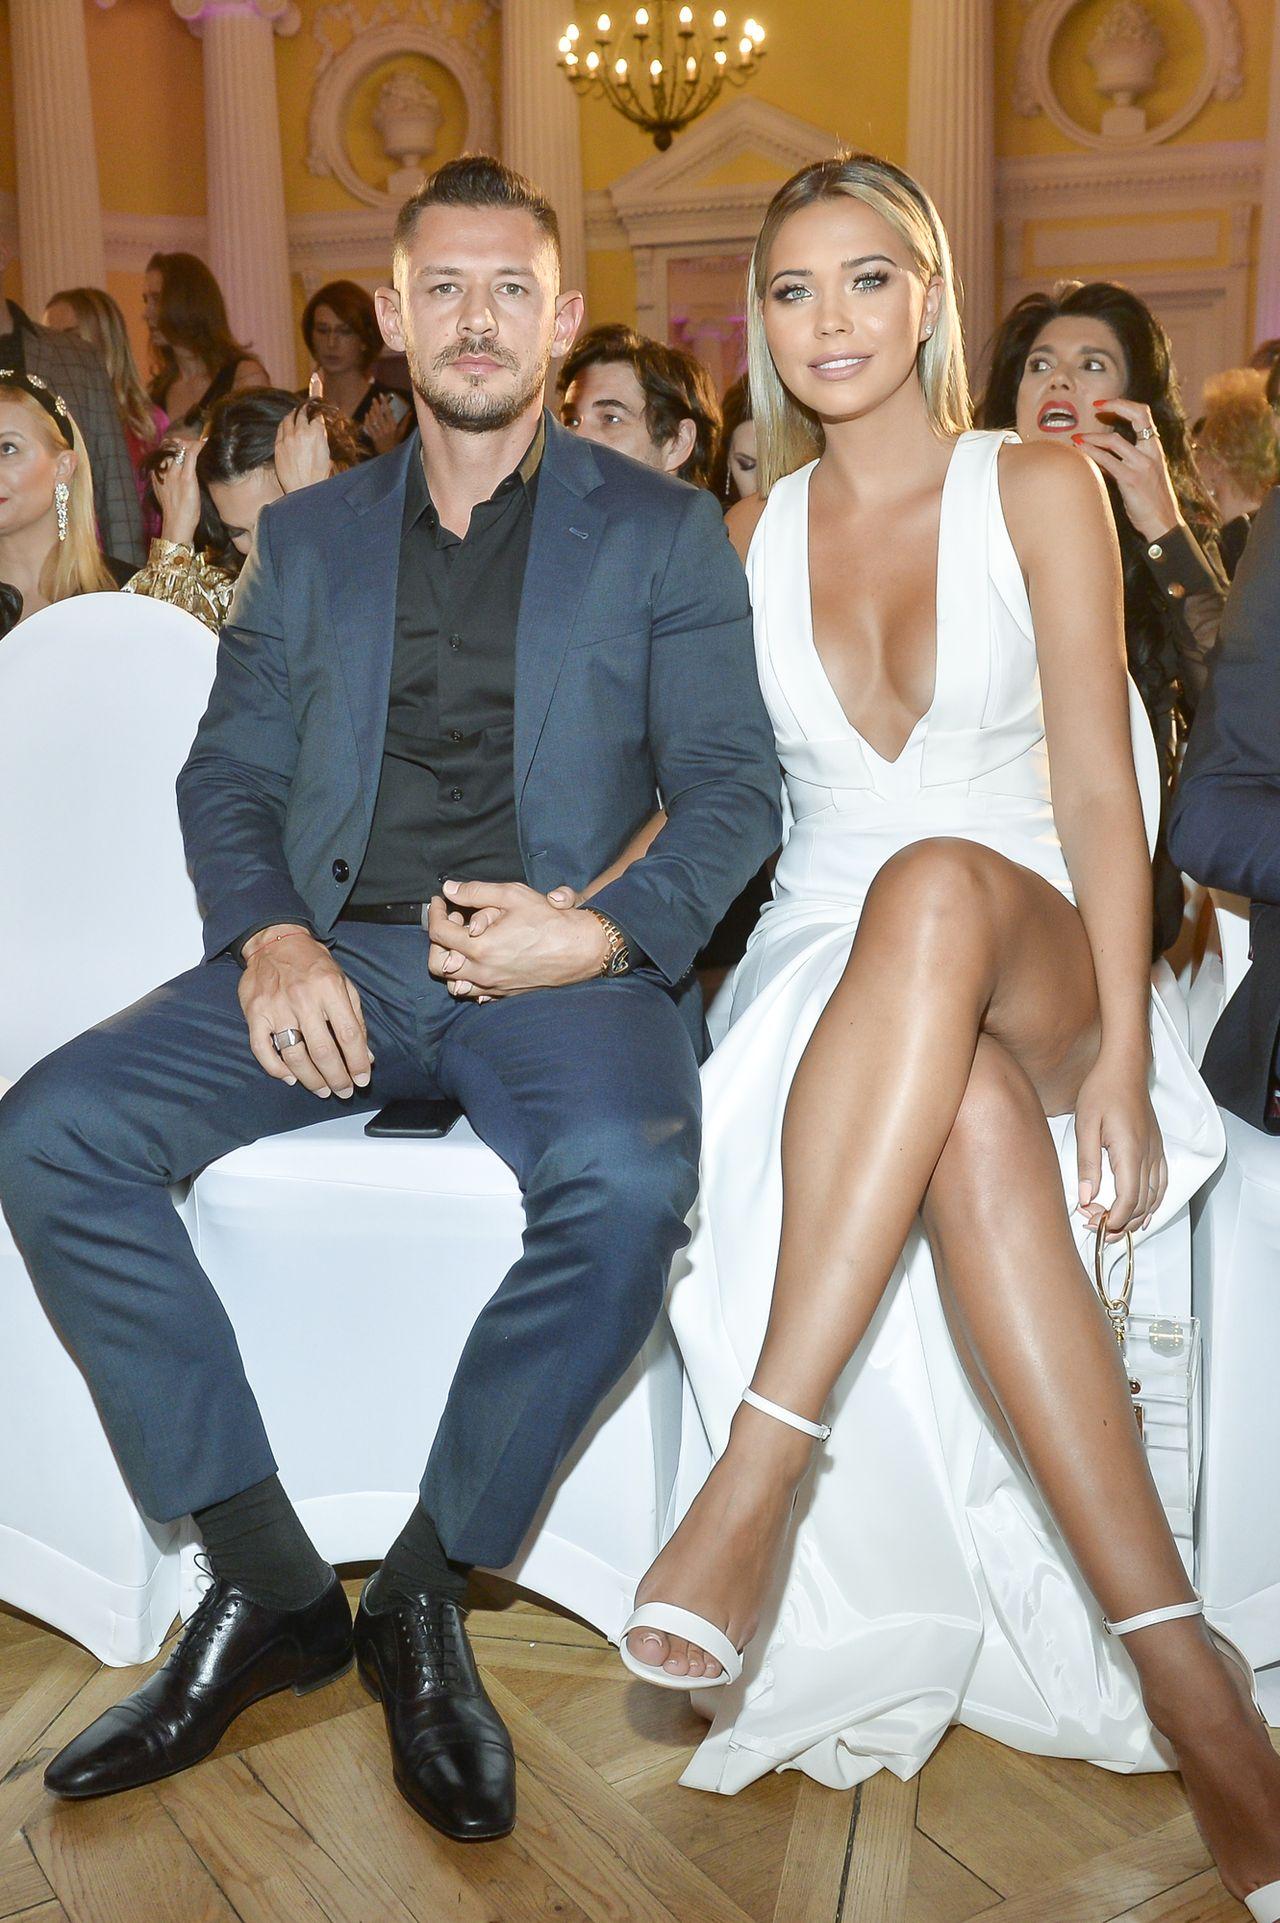 Sandra Kubicka z chłopakiem, Kaio Alvesem Goncalvesem